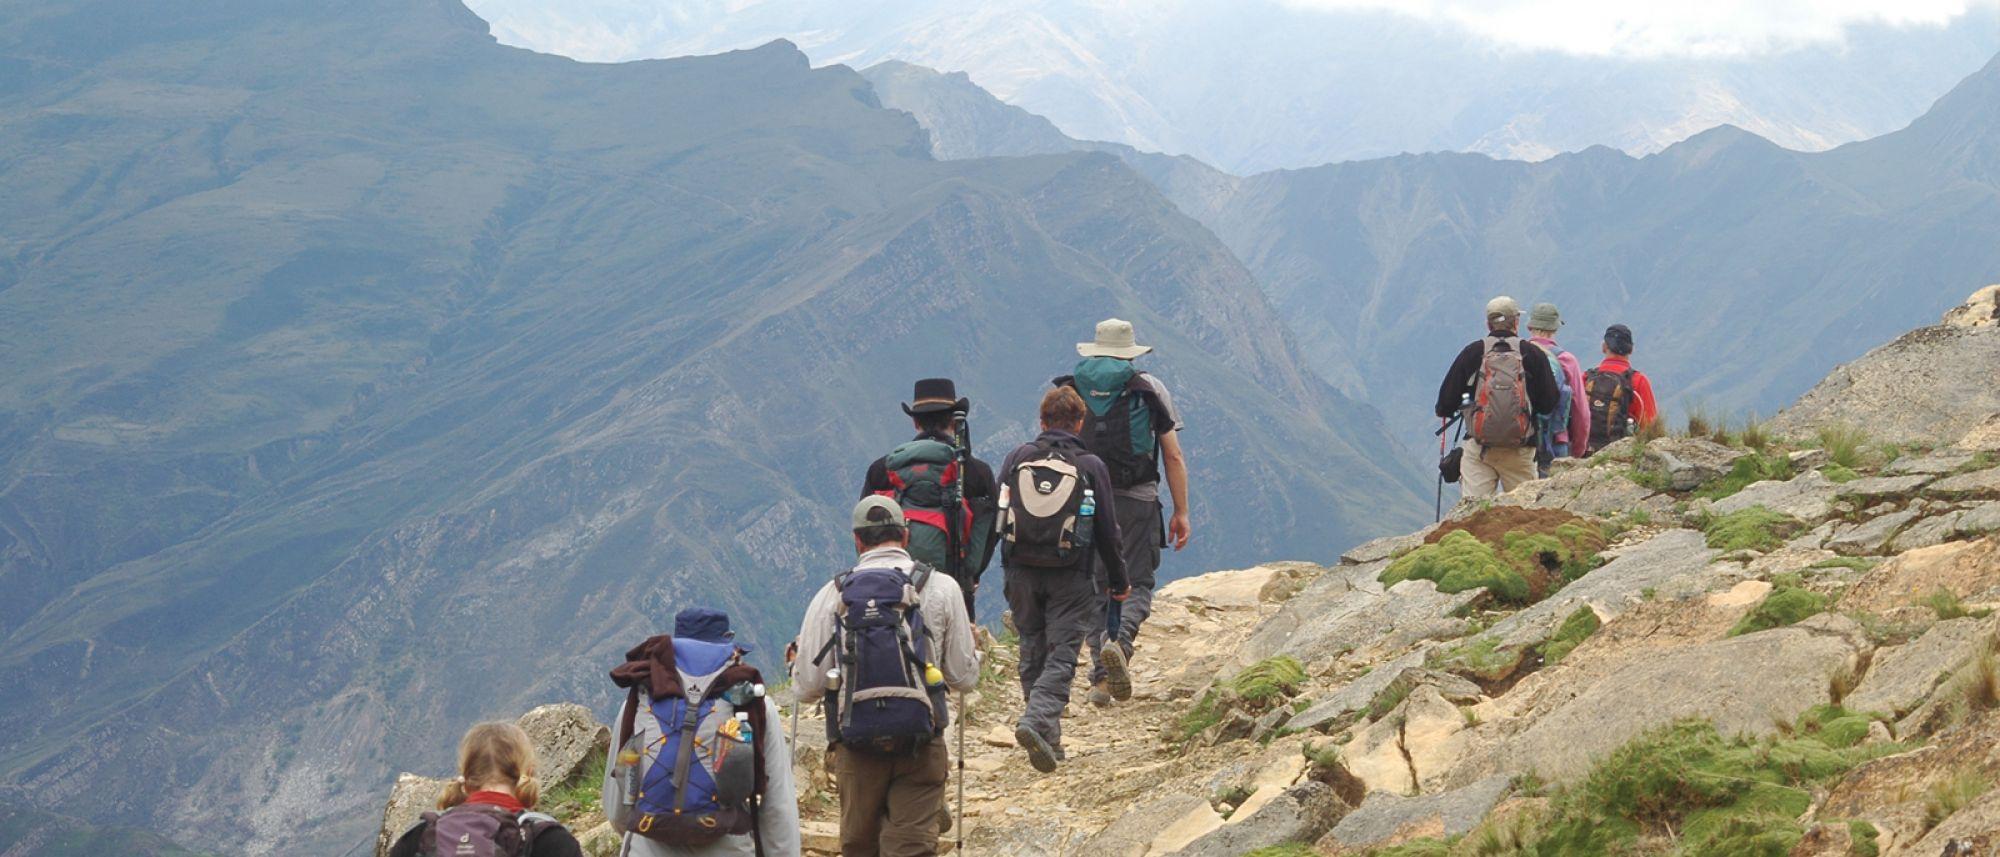 argentine salta nord ouest argentin trek trekking randonnée montagne excursion paysage nature